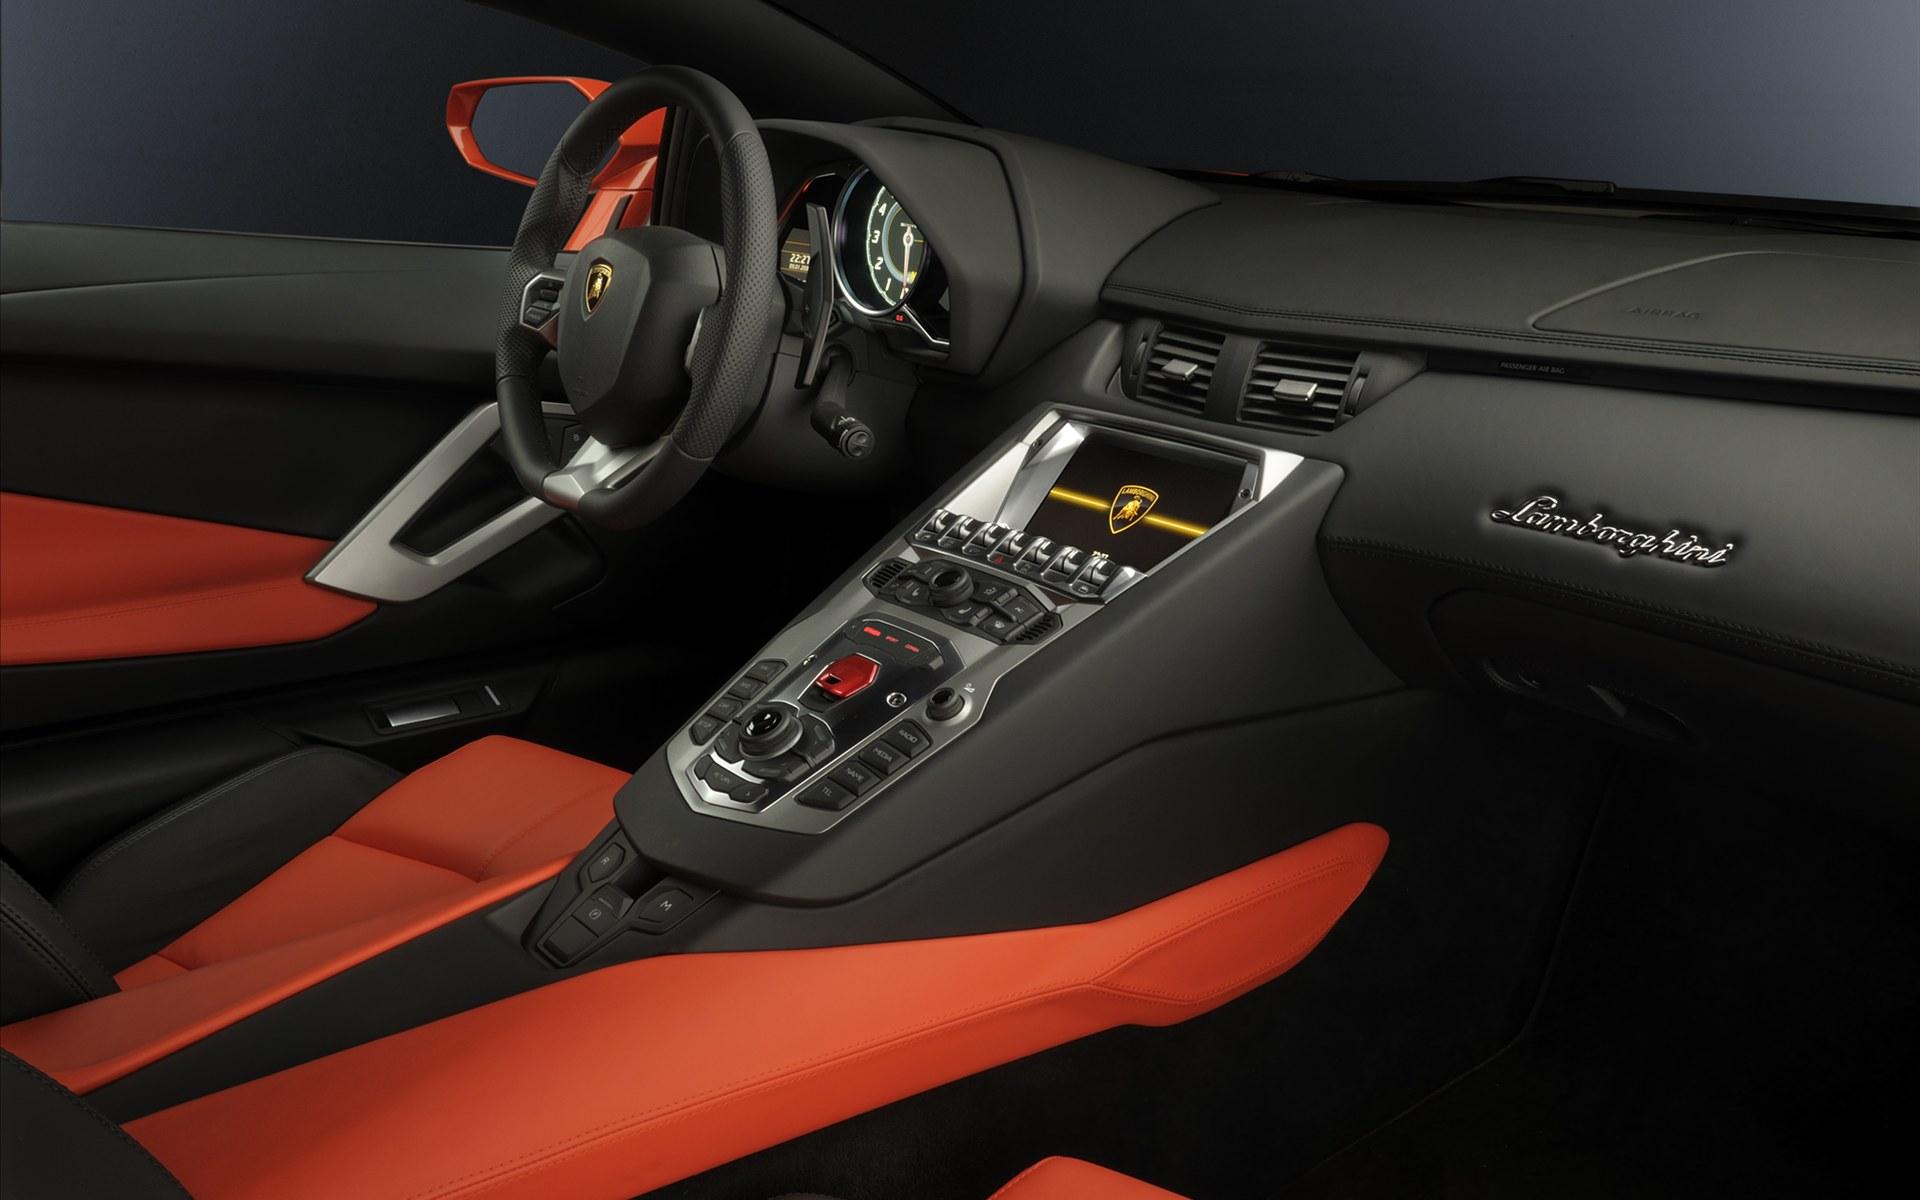 2011 Lamborghini Aventador Interior Interior Lamborghini